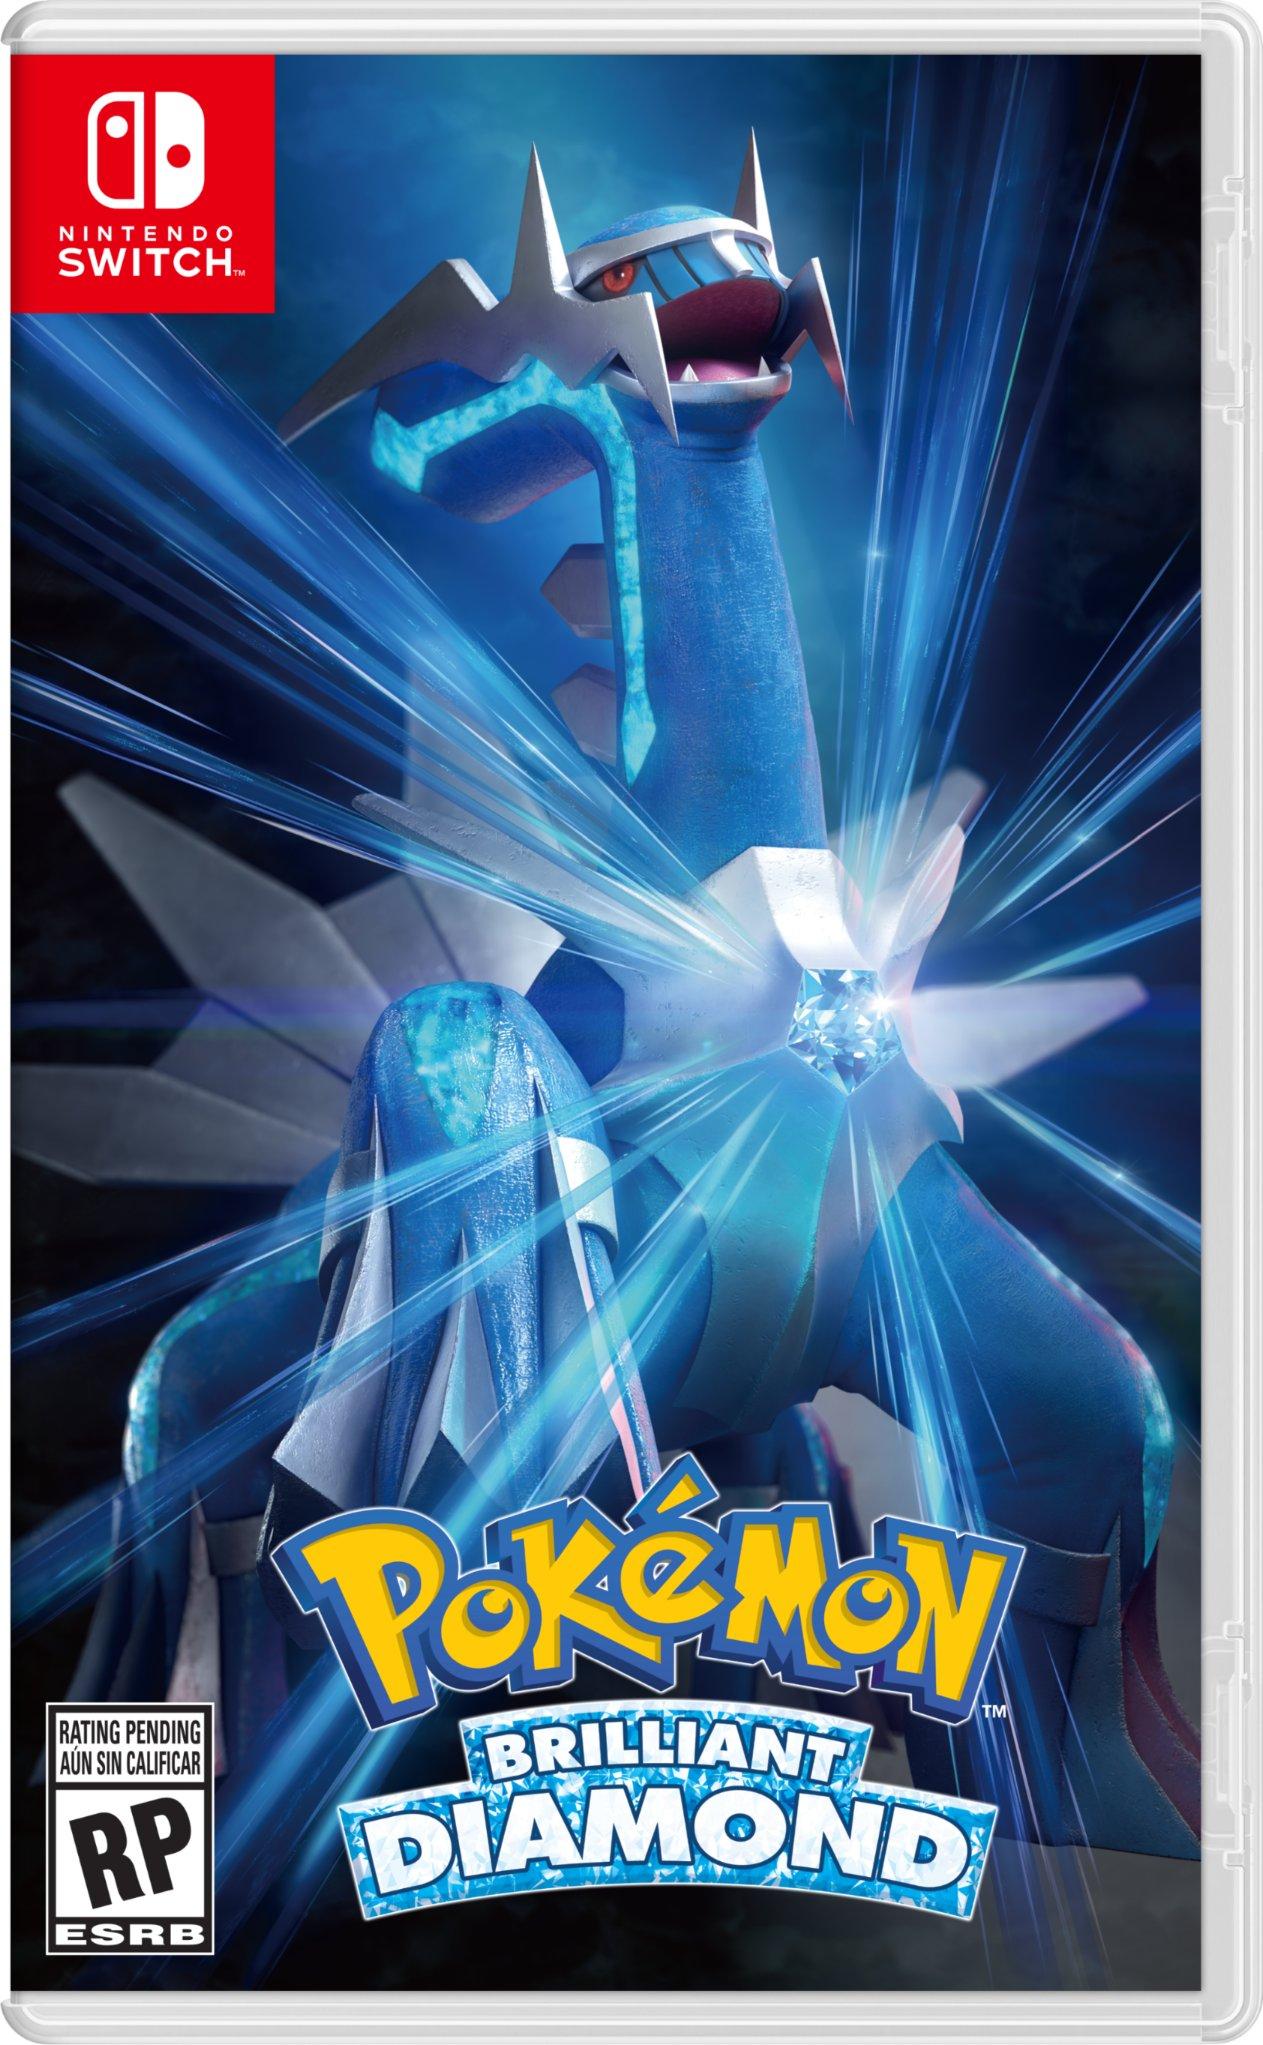 Pokémon Diamant Etincelant / Perle Scintillante E2USErdWYAUZxv7?format=jpg&name=large